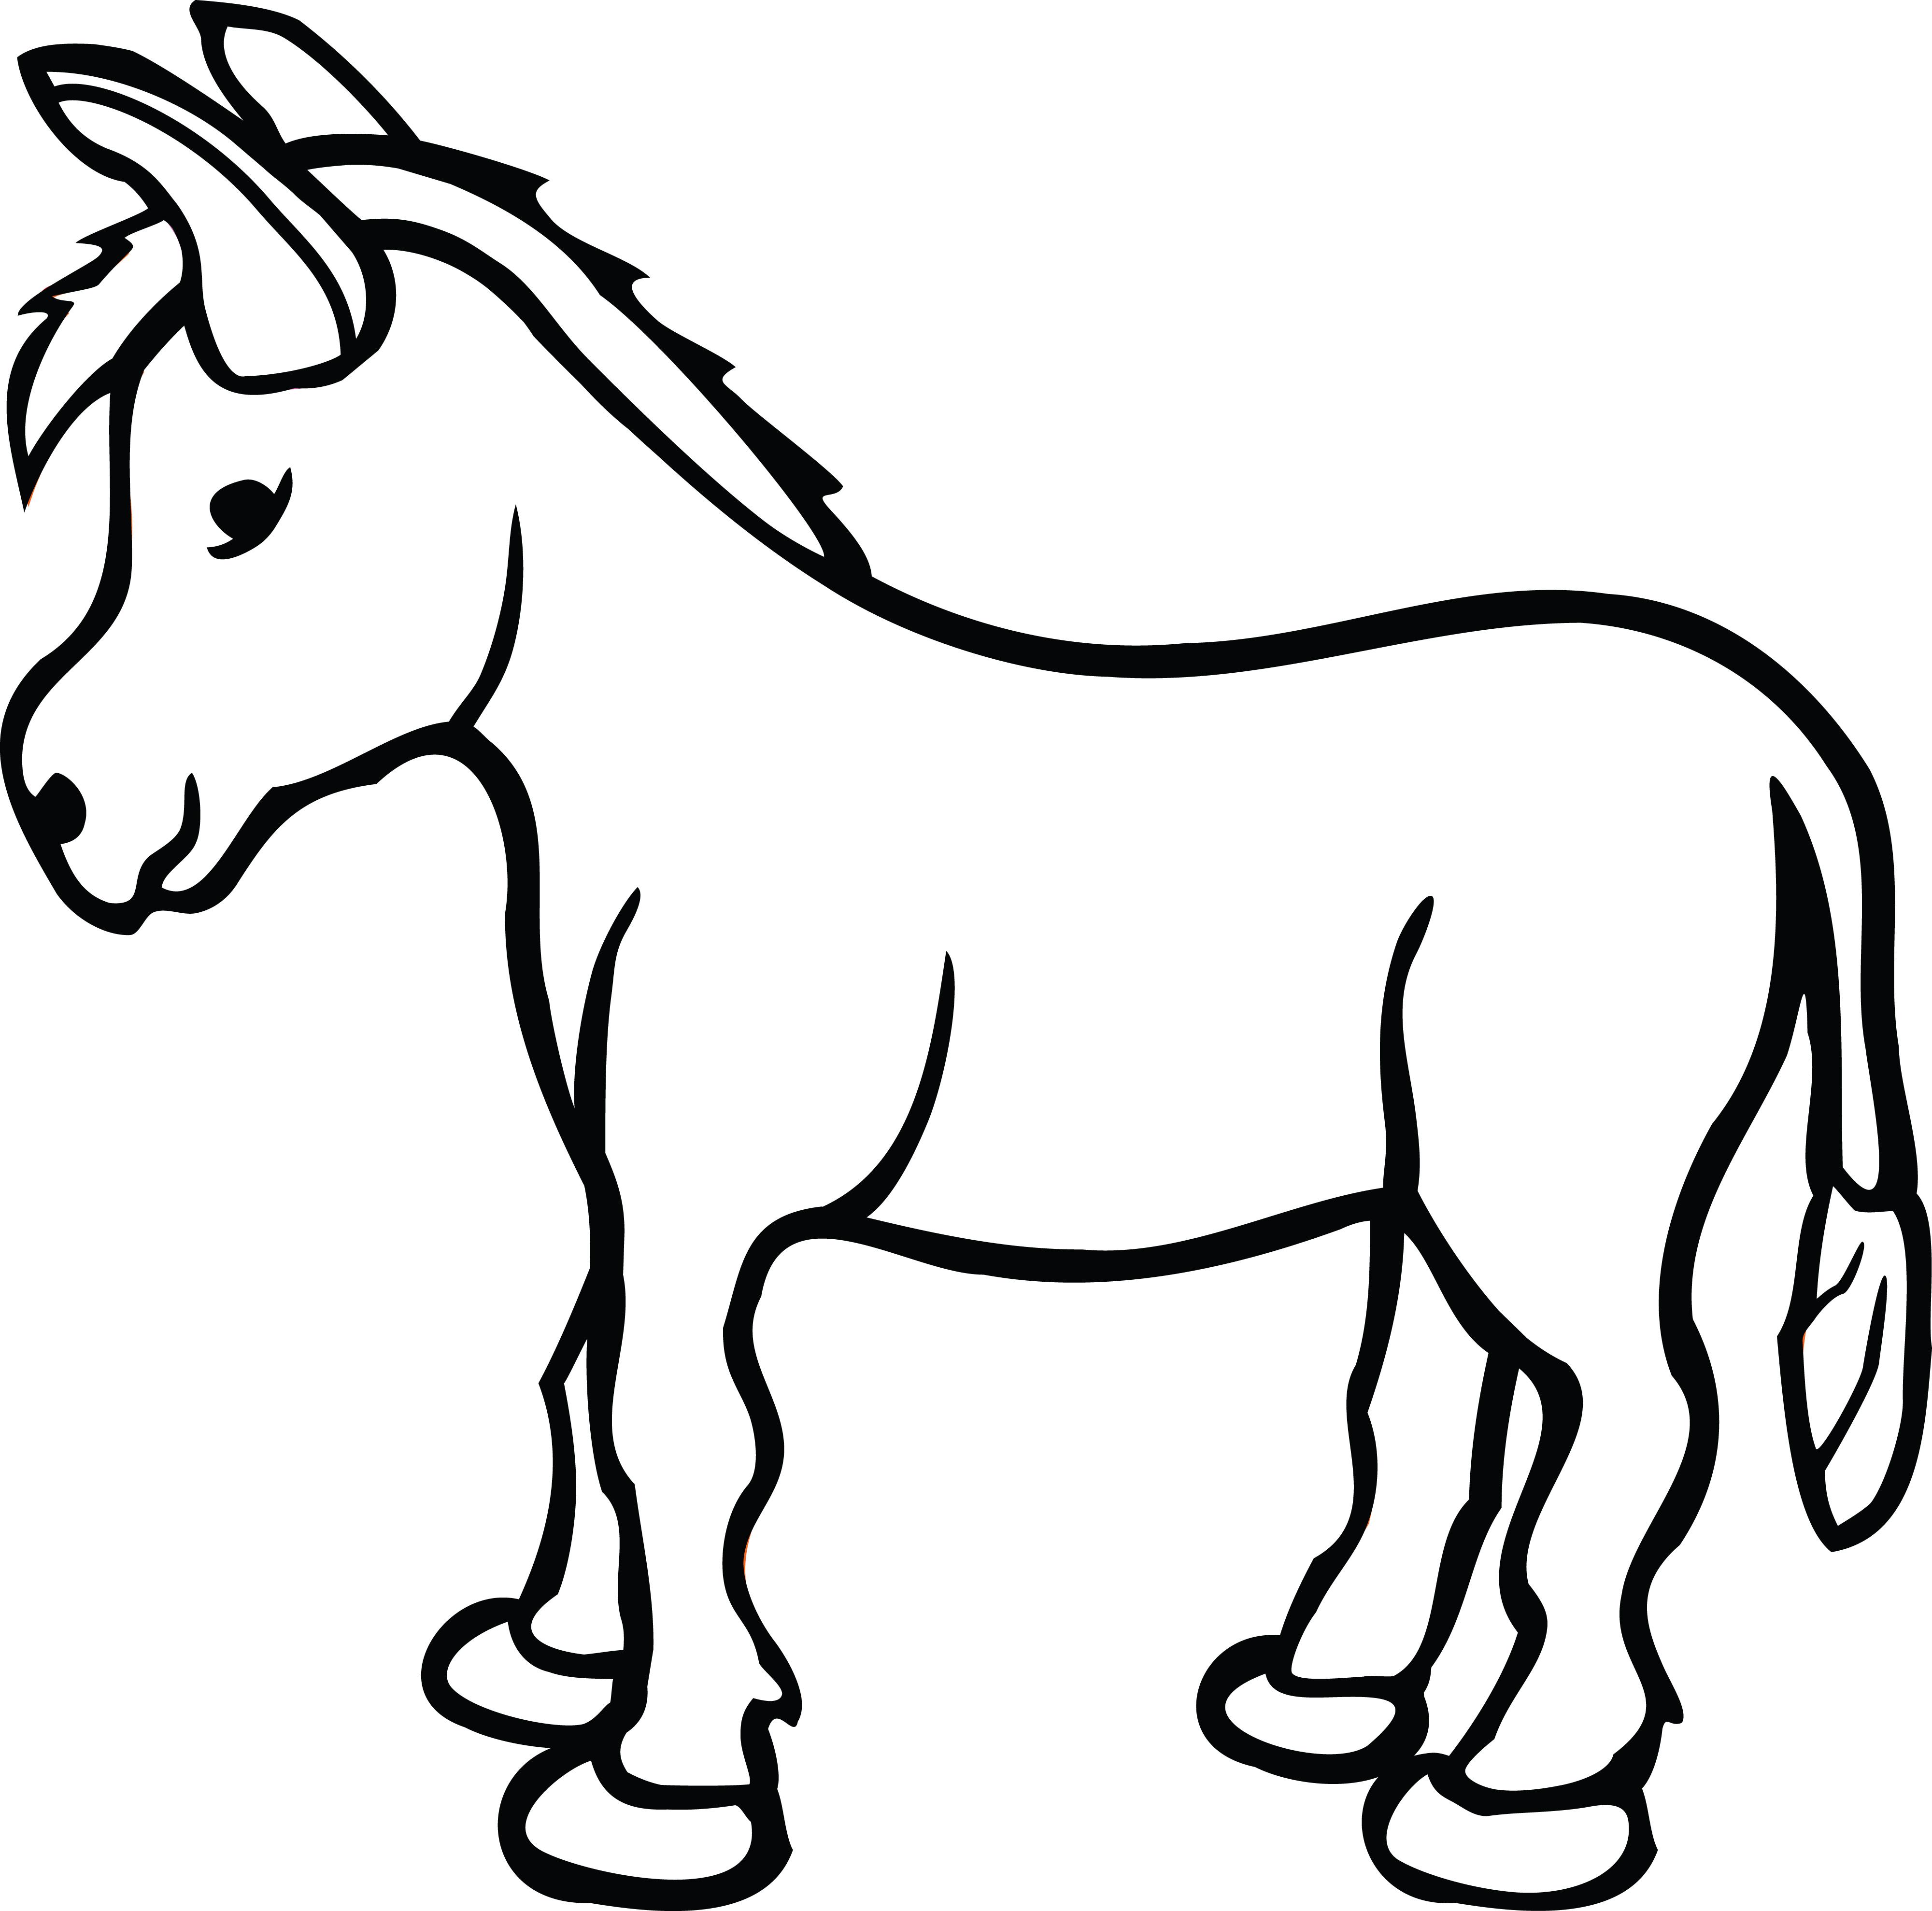 4000x3957 Free Clipart Donkey 101 Clip Art